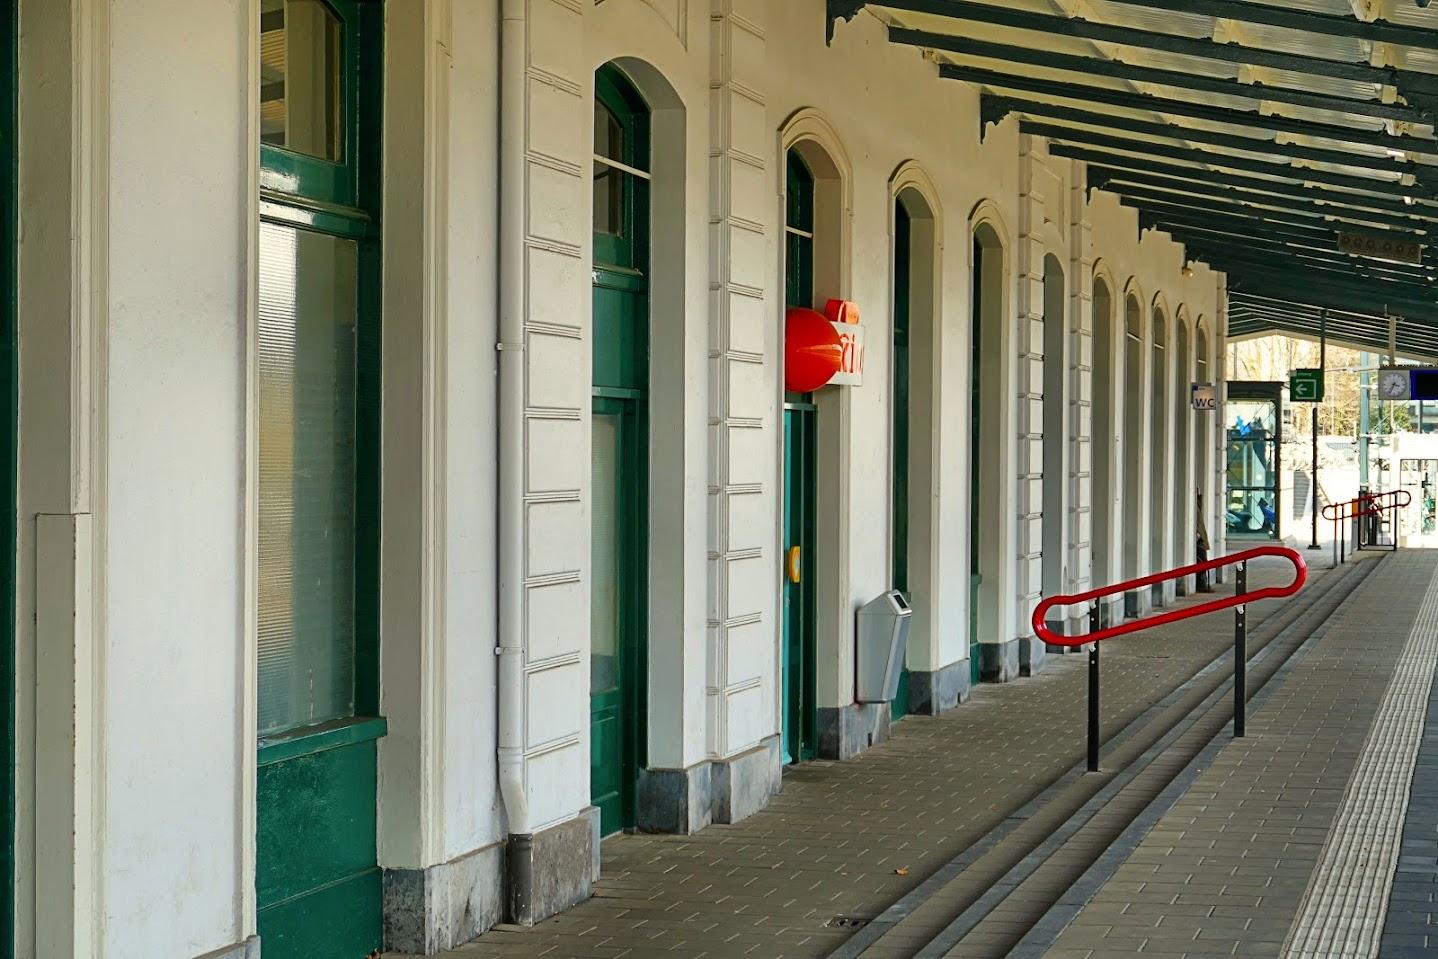 Aangeboden door: Stichting Microtoerisme InZicht Fotoblog Meppel station